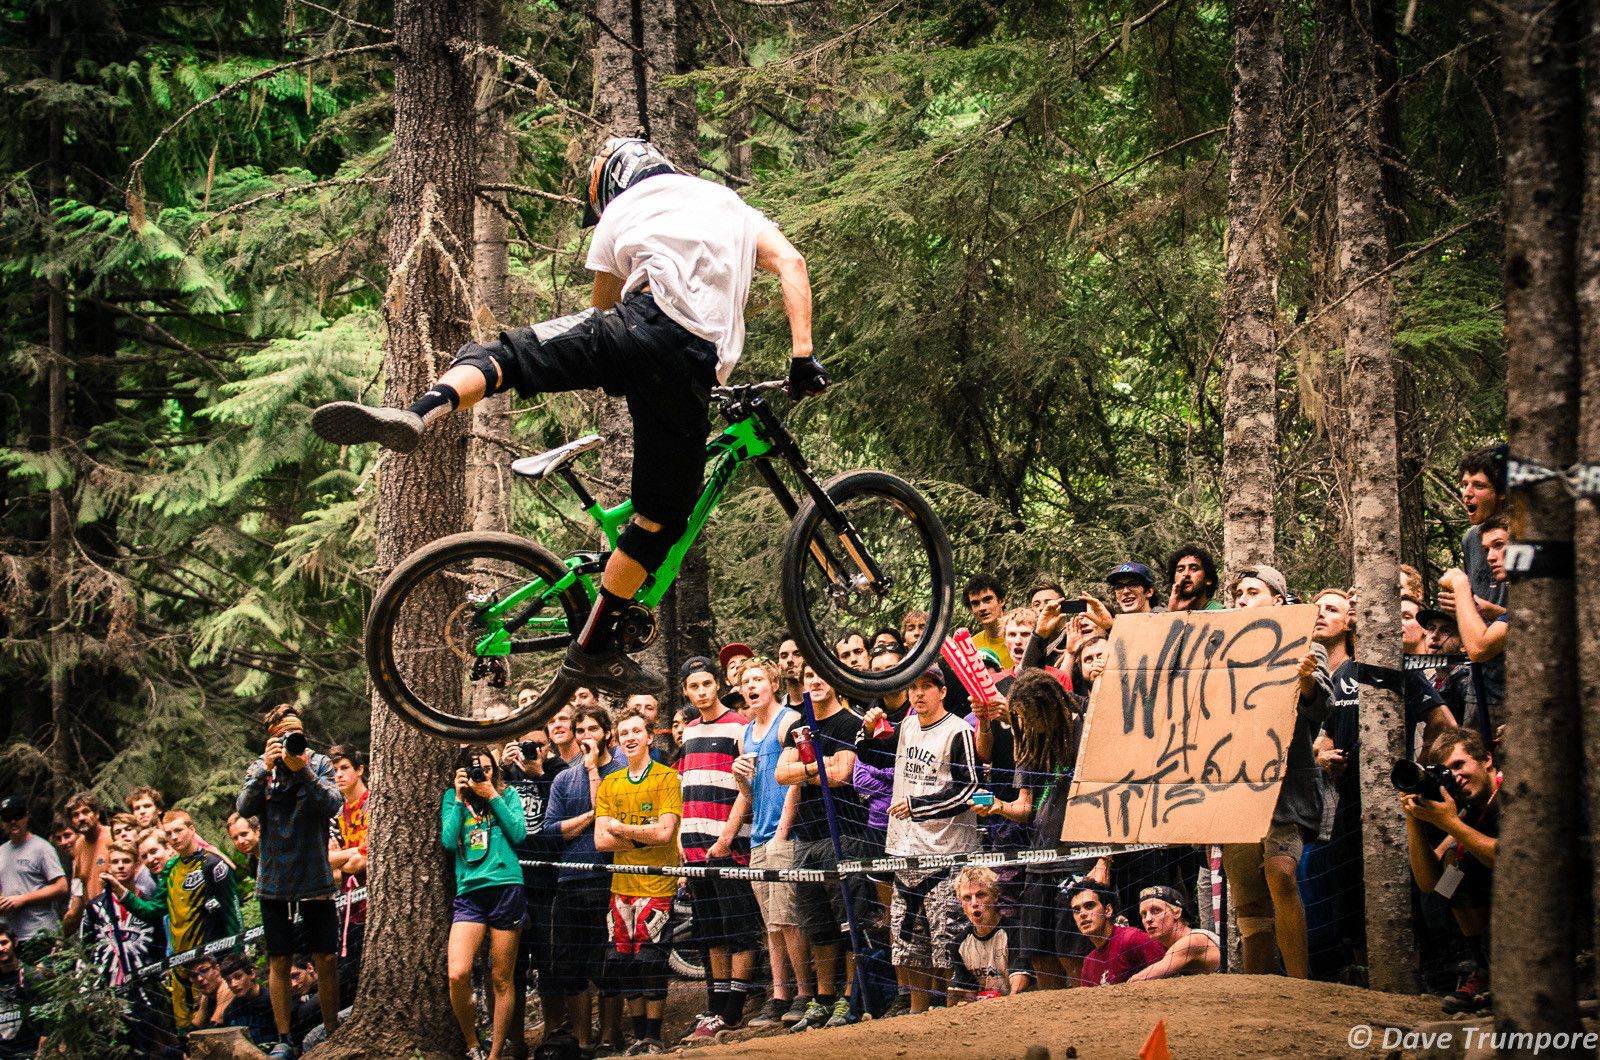 It's Still All About the Whip at Crankworx Air DH - Crankworx Whistler Air DH - Mountain Biking Pictures - Vital MTB